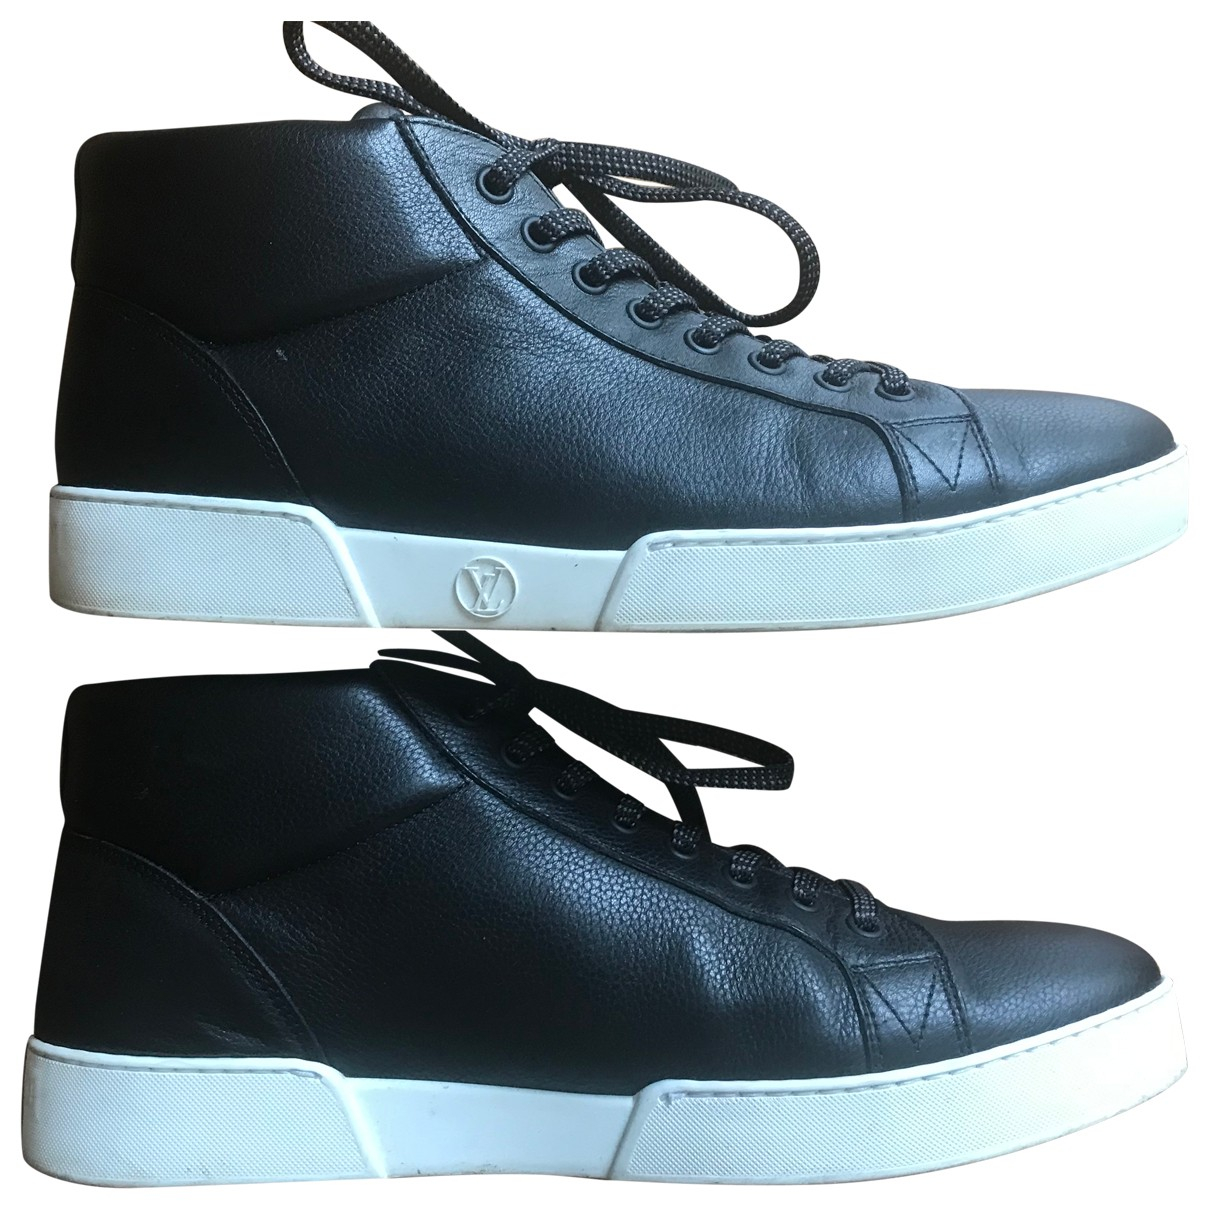 Louis Vuitton N Black Leather Trainers for Men 41.5 EU